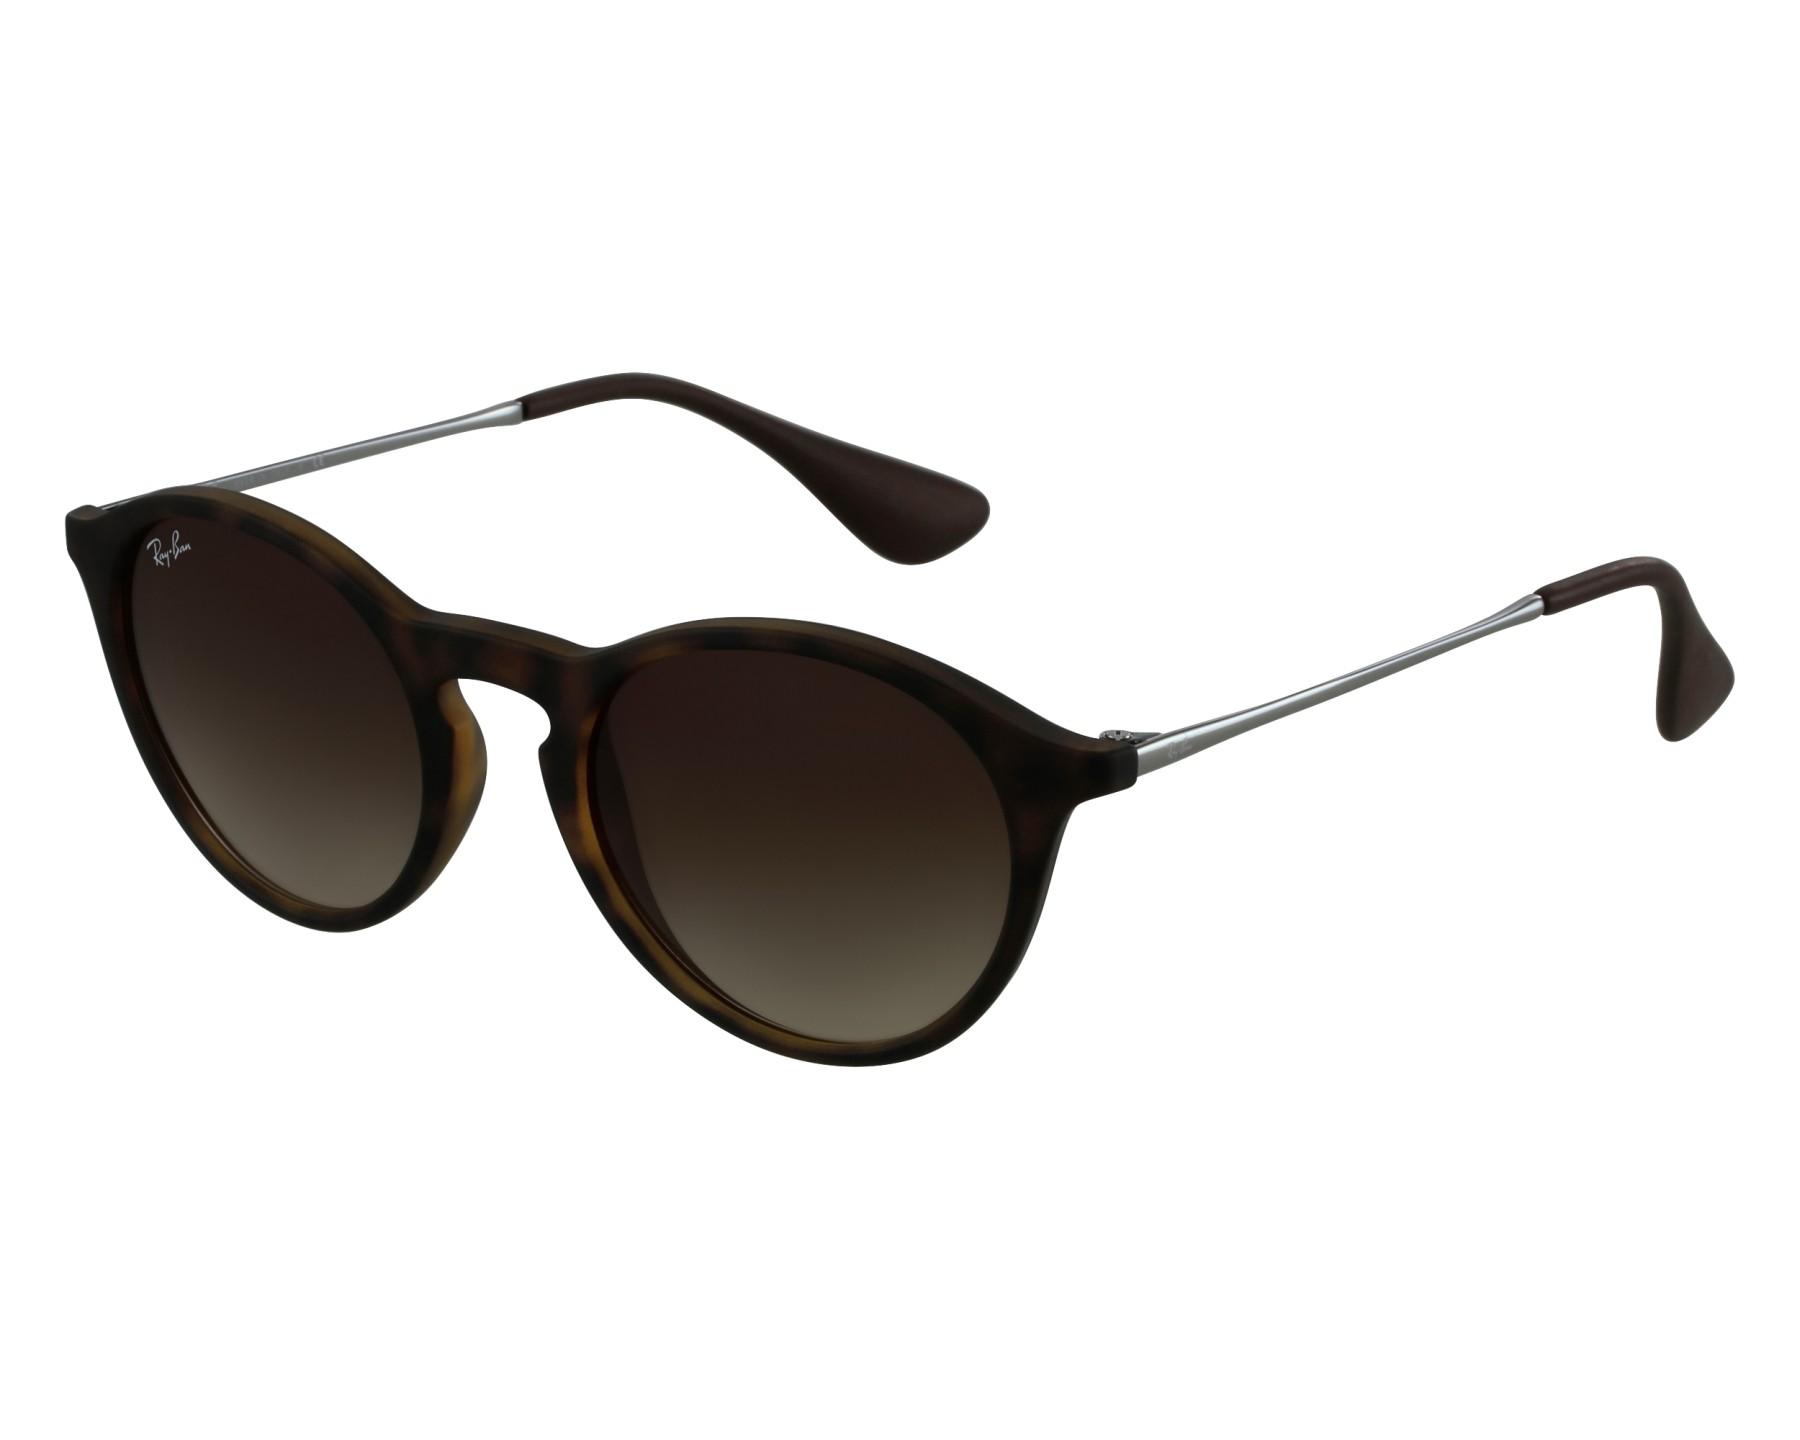 9e04435d84b thumbnail Sunglasses Ray-Ban RB-4243 865 13 - Havana Gun front view